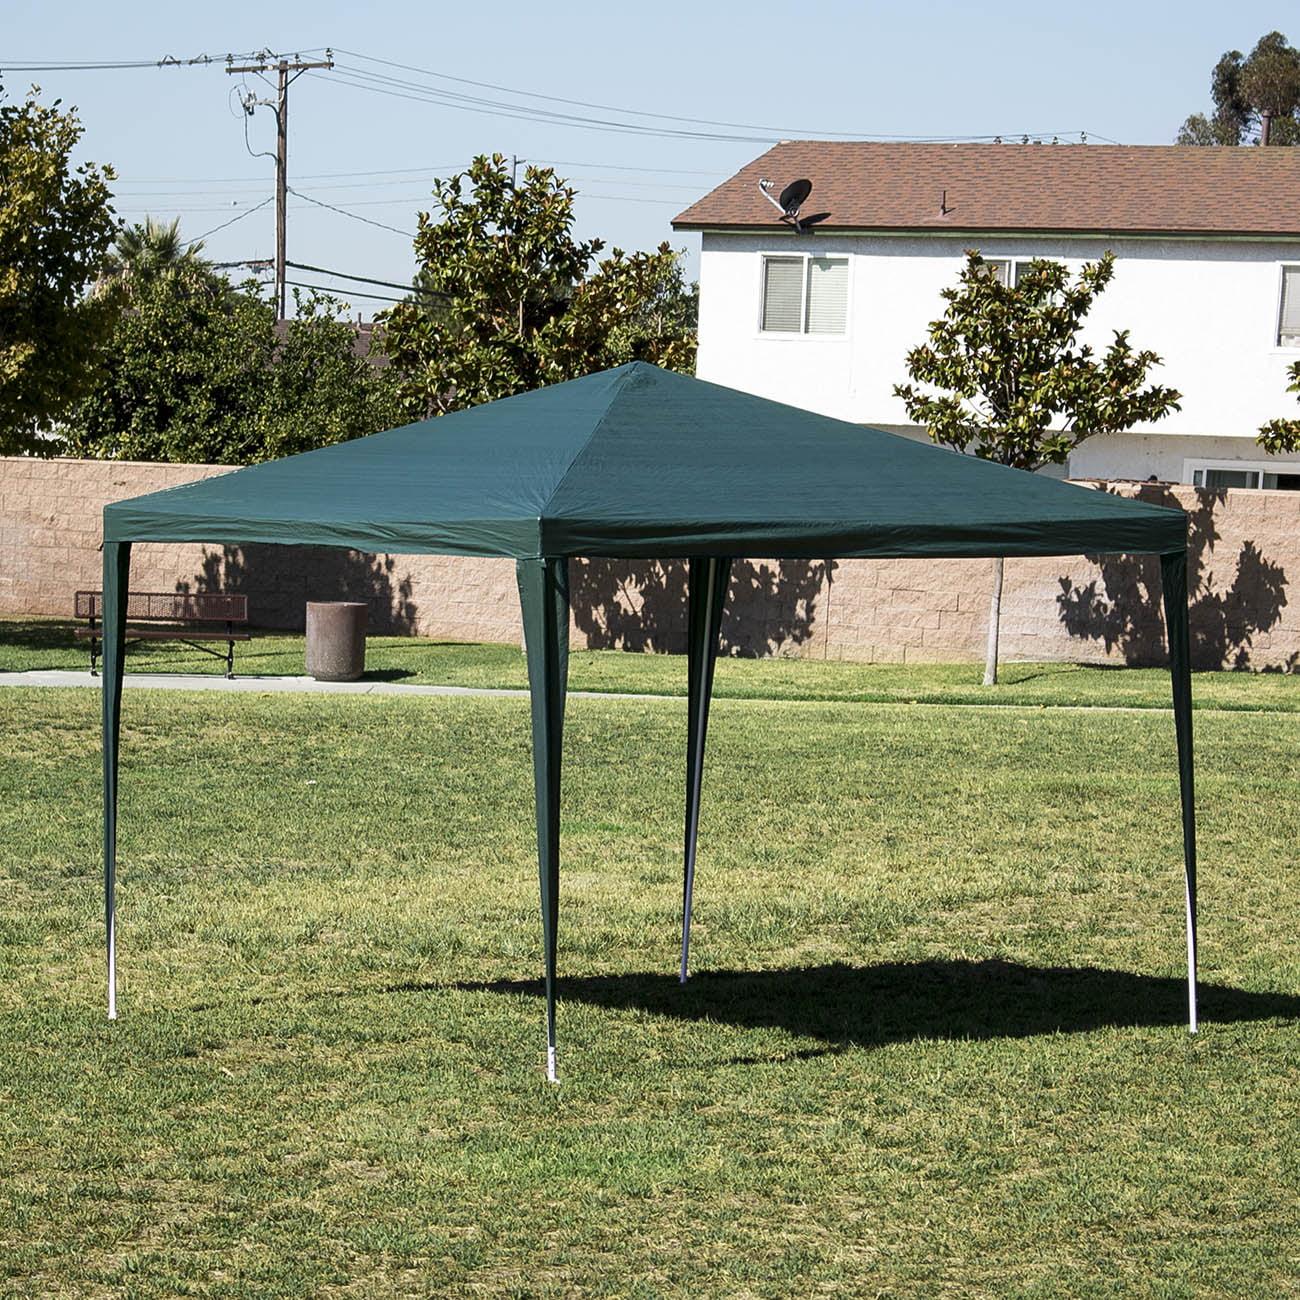 Belleze 10'x10' Commercial Party Tent Gazebo Canopy Event Wedding Outdoor Backyard, Green